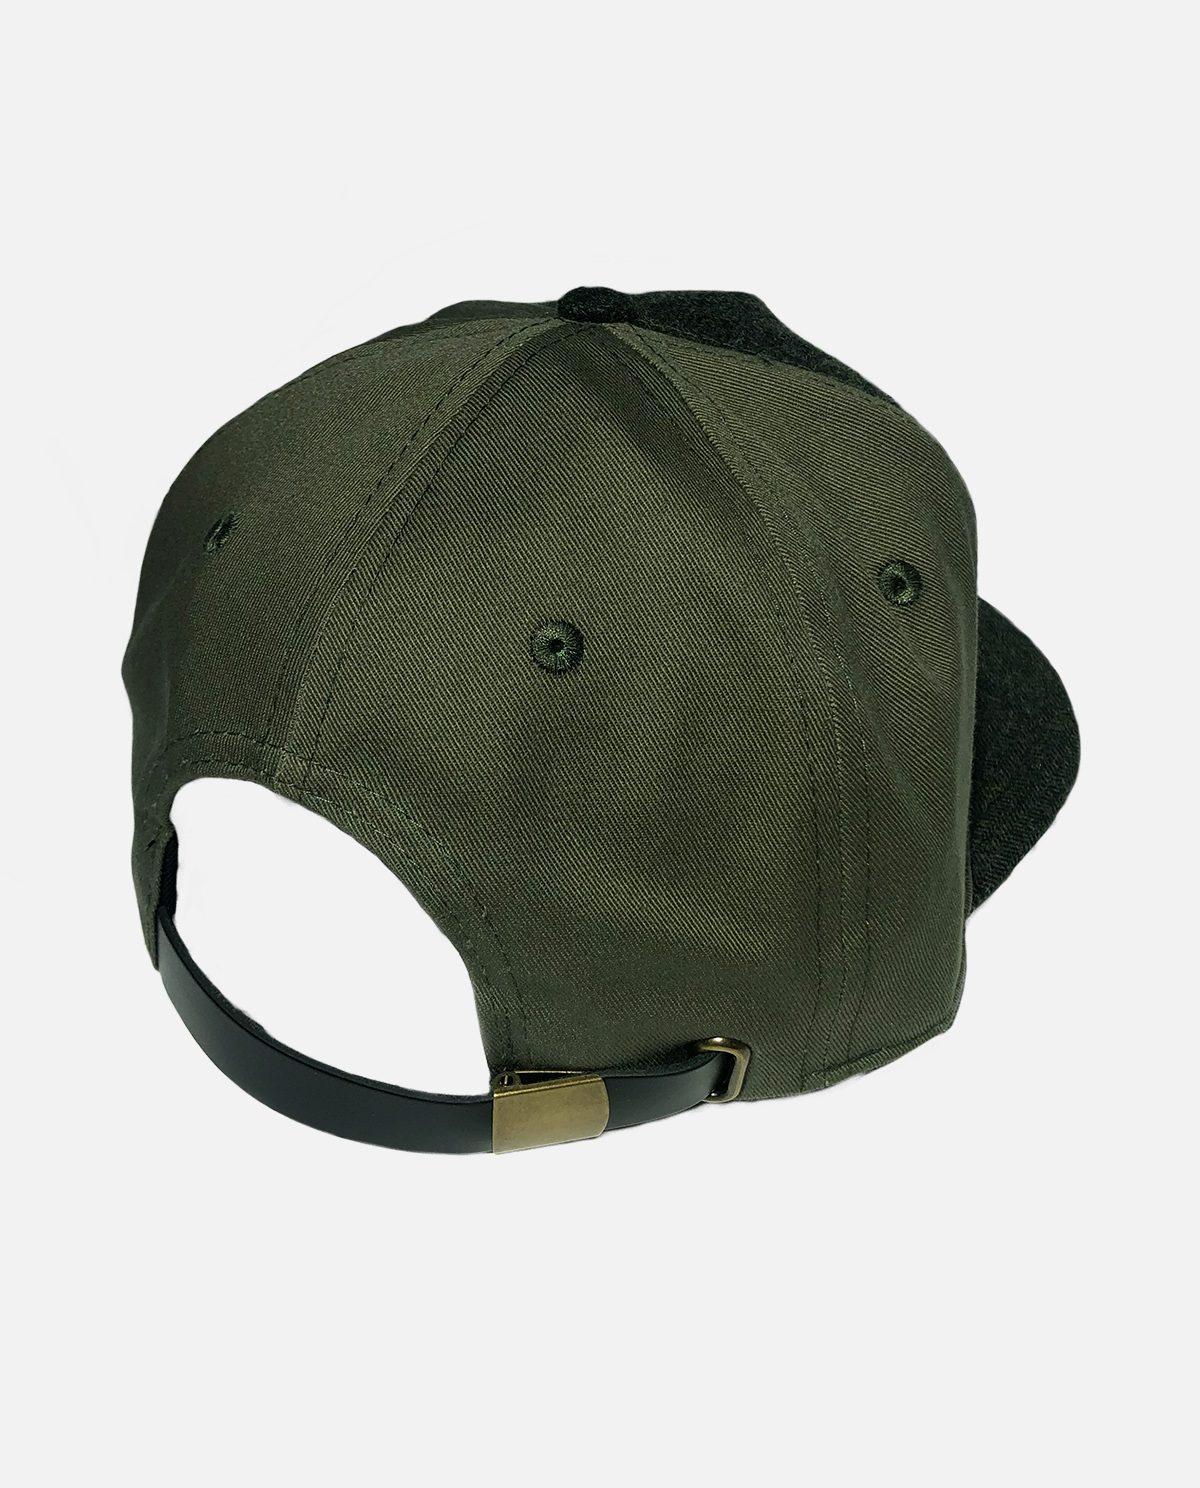 nysea-20wintercollection_hat-skyline-harringbone-back